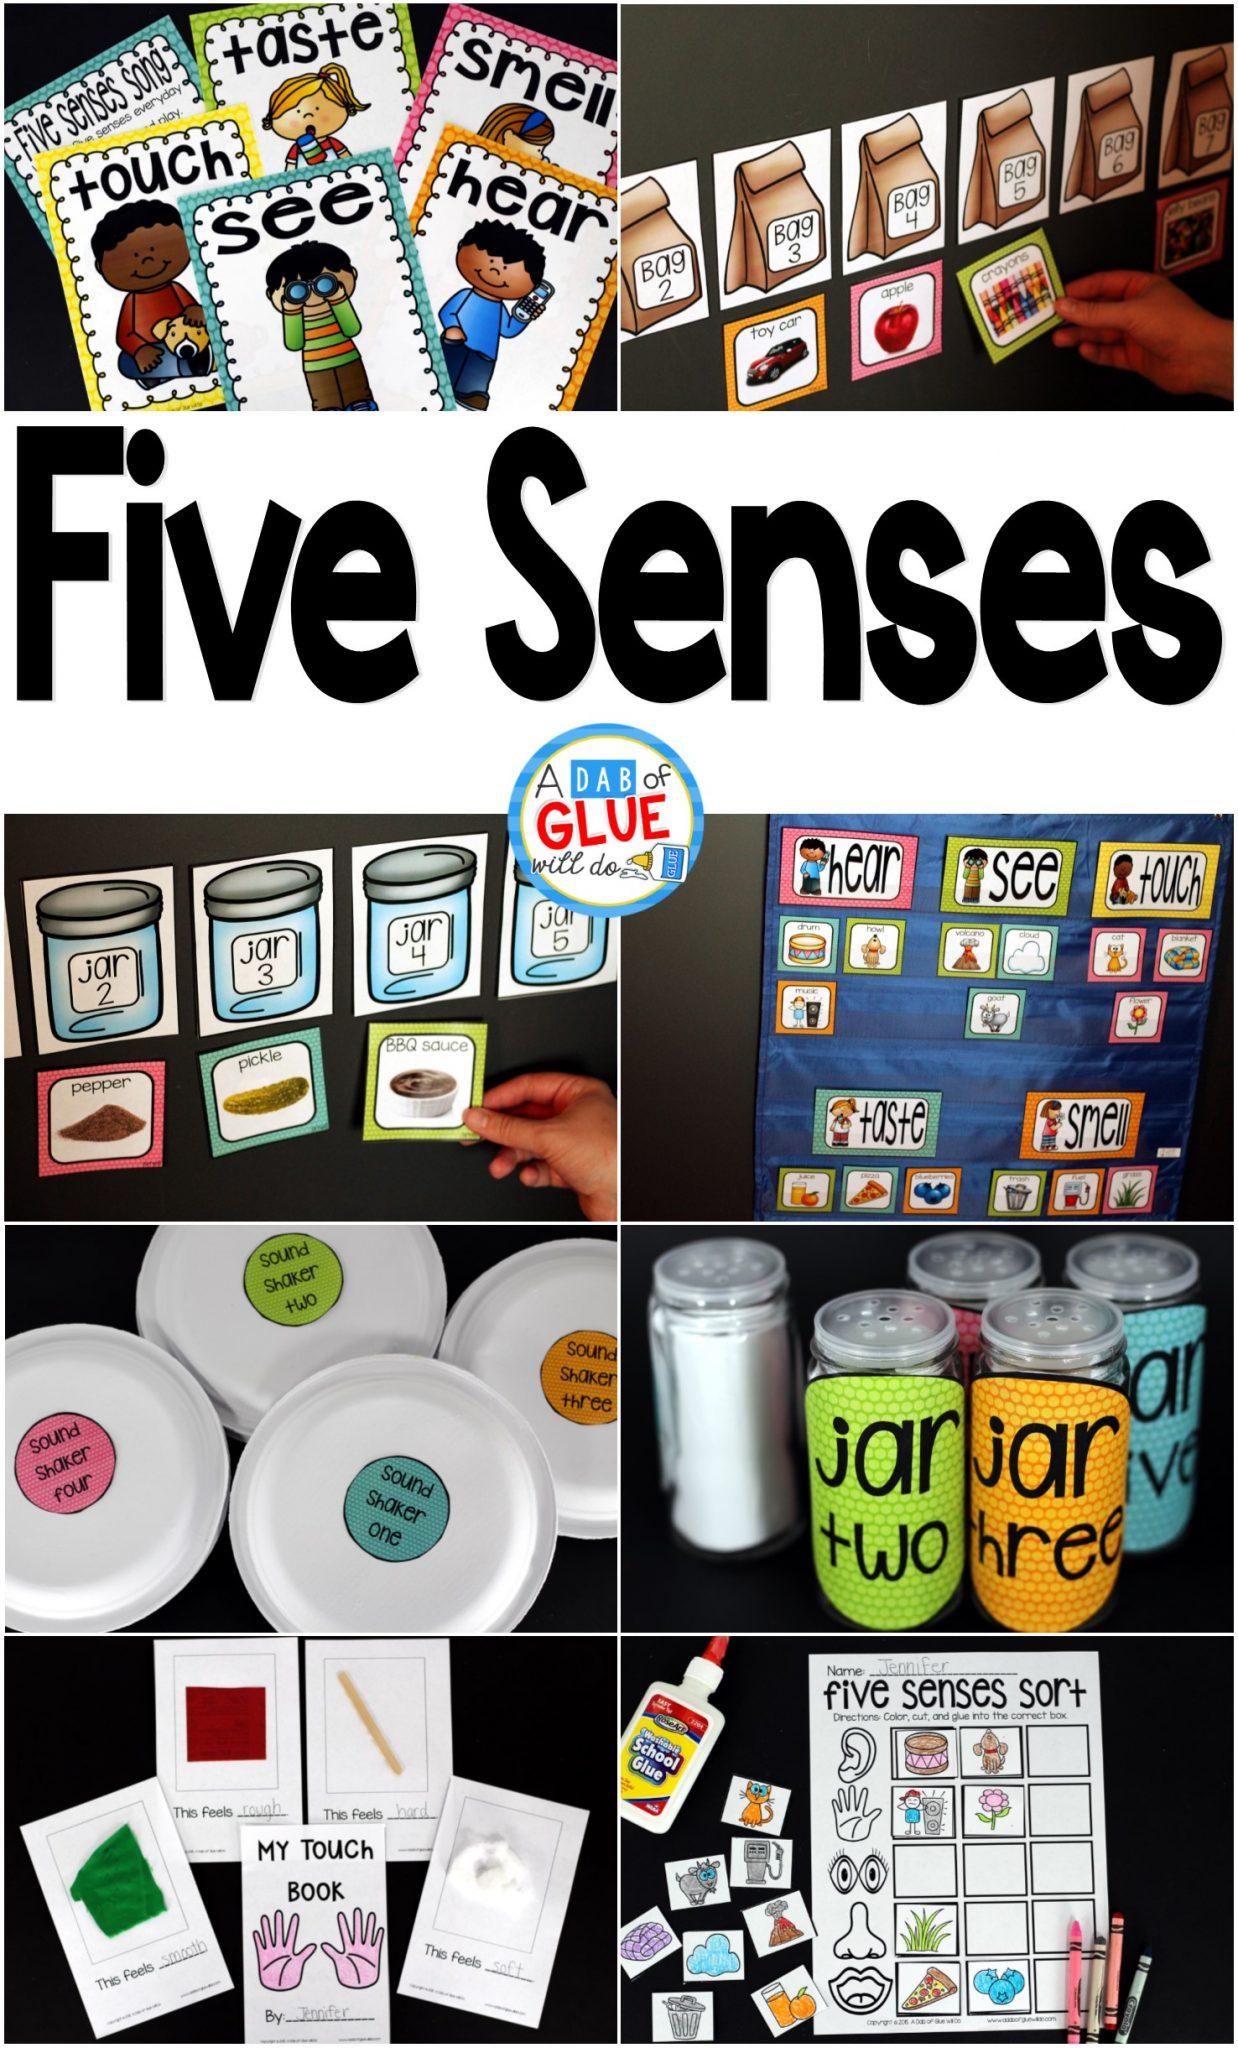 five senses a dab of glue will do